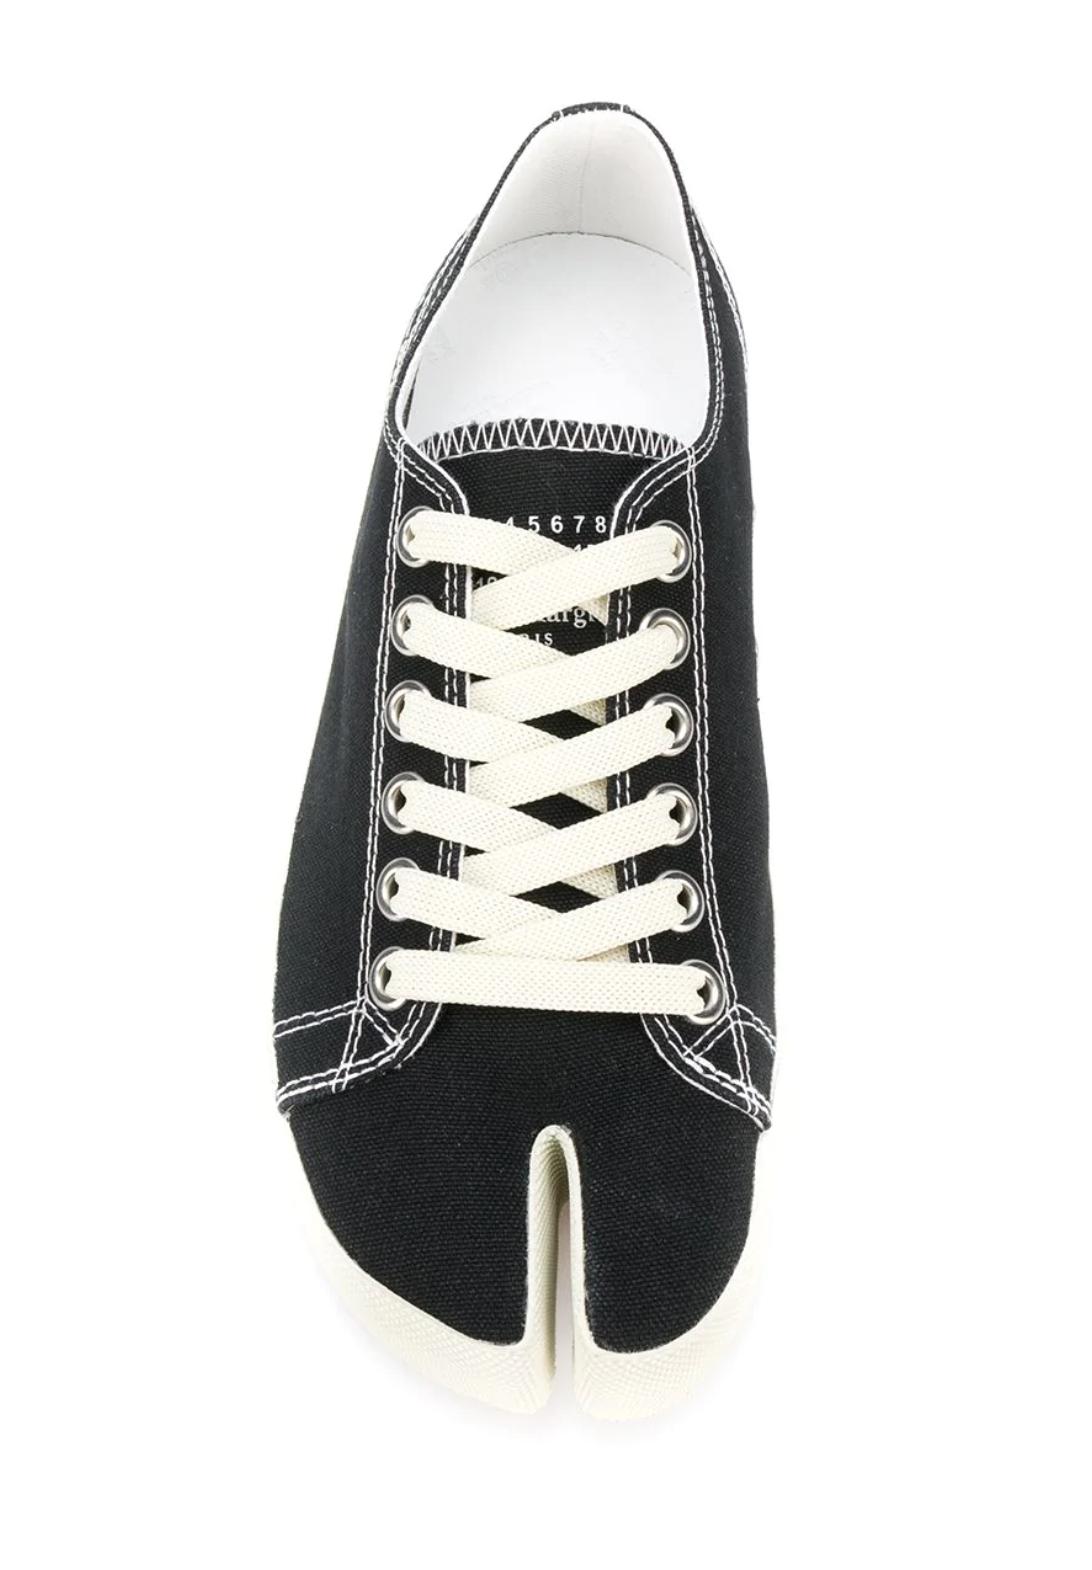 tabi sneakers womens